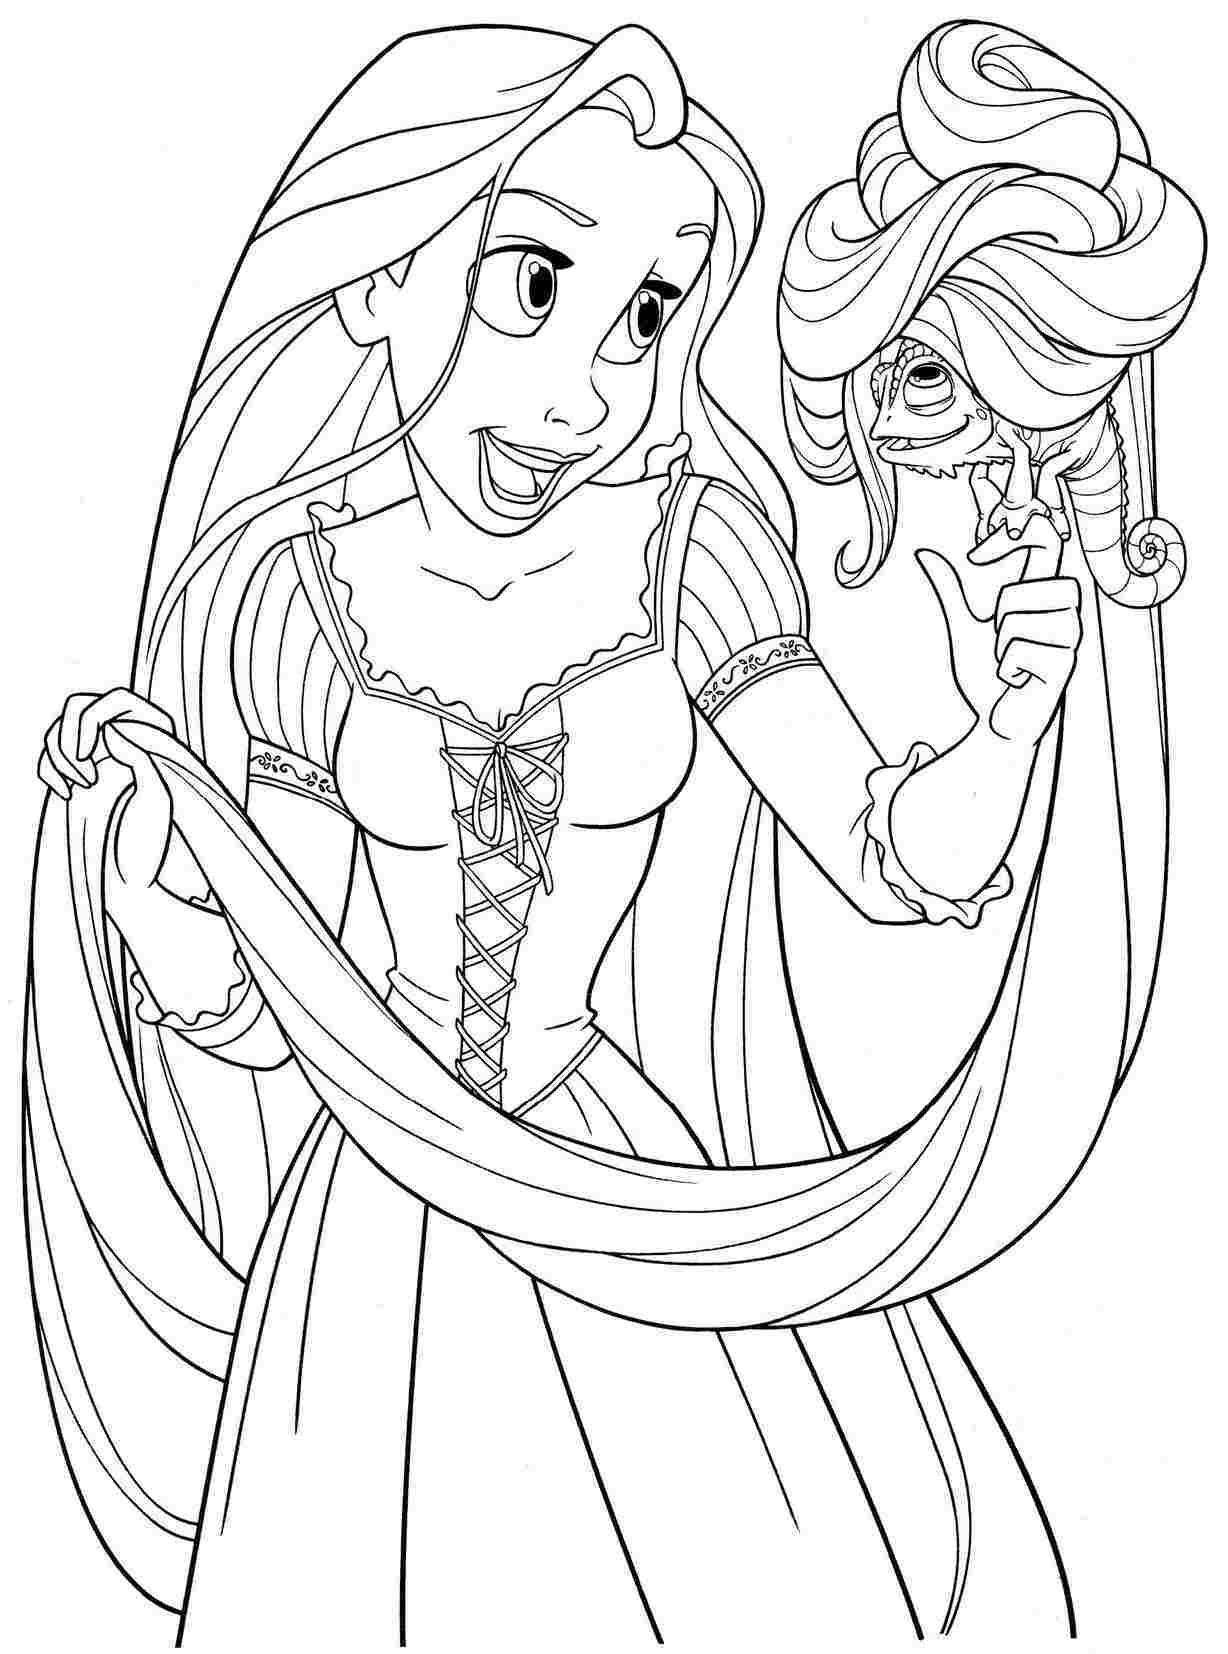 desenhos-para-colorir-princesa-rapunzel